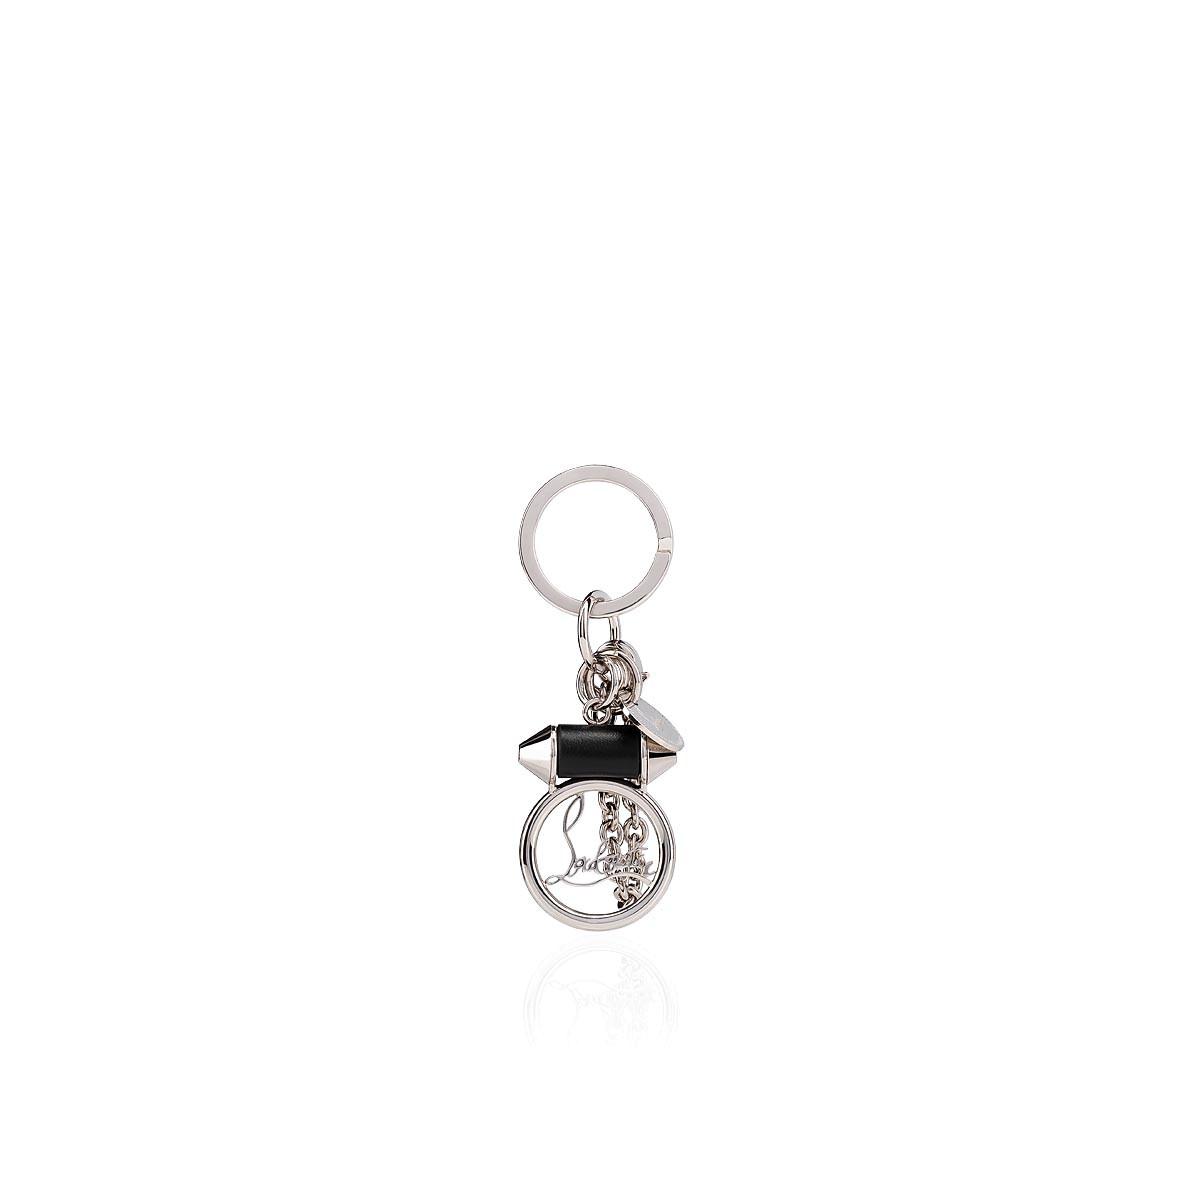 Accessories - Ruby Lou Mini Keyring - Christian Louboutin